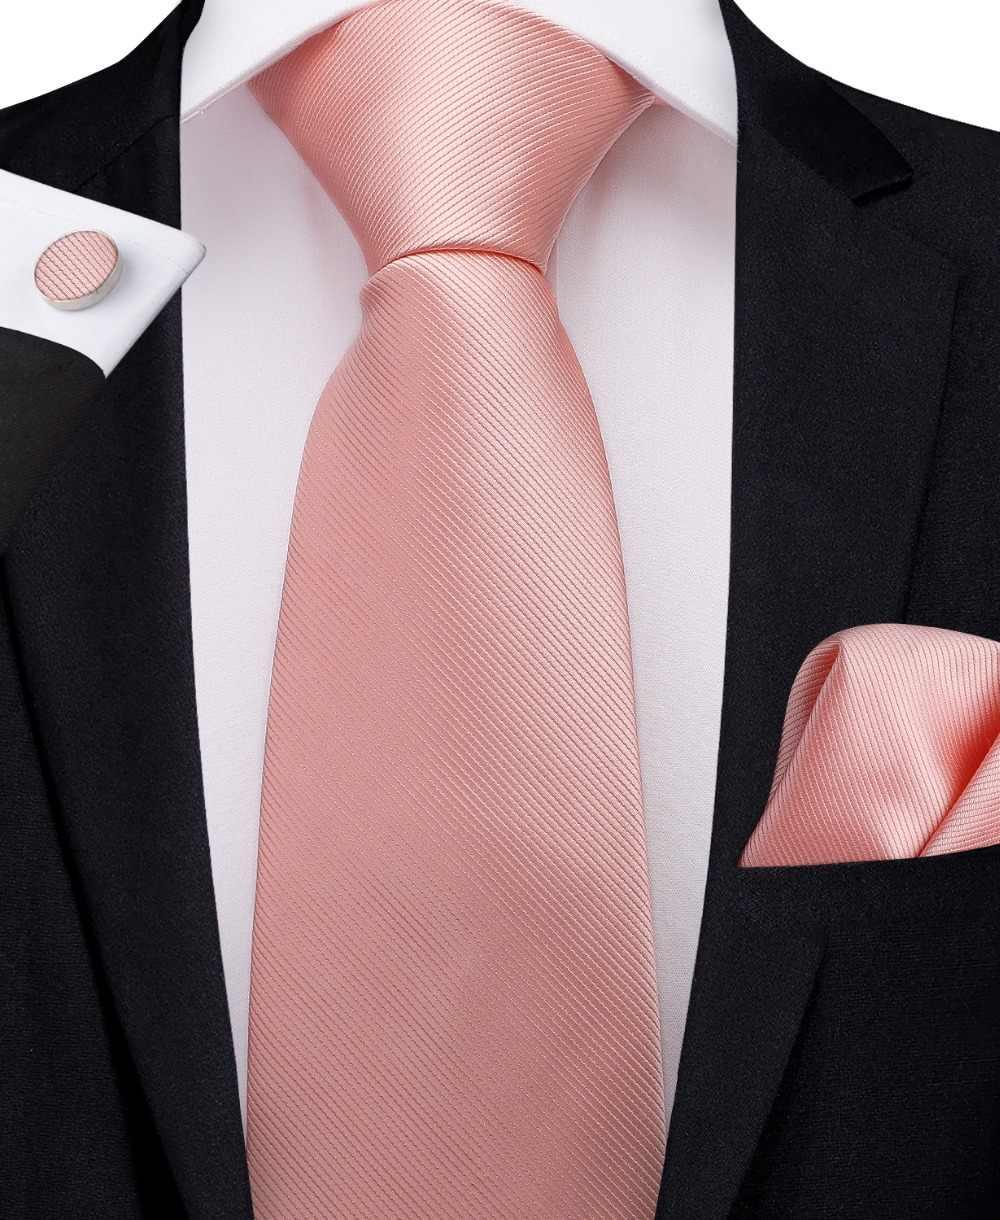 0ebe8bdeaa94 SJT-7242 DiBanGu Luxury Pink Solid Ties for Men Hanky Cufflinks Ties 100%  Silk